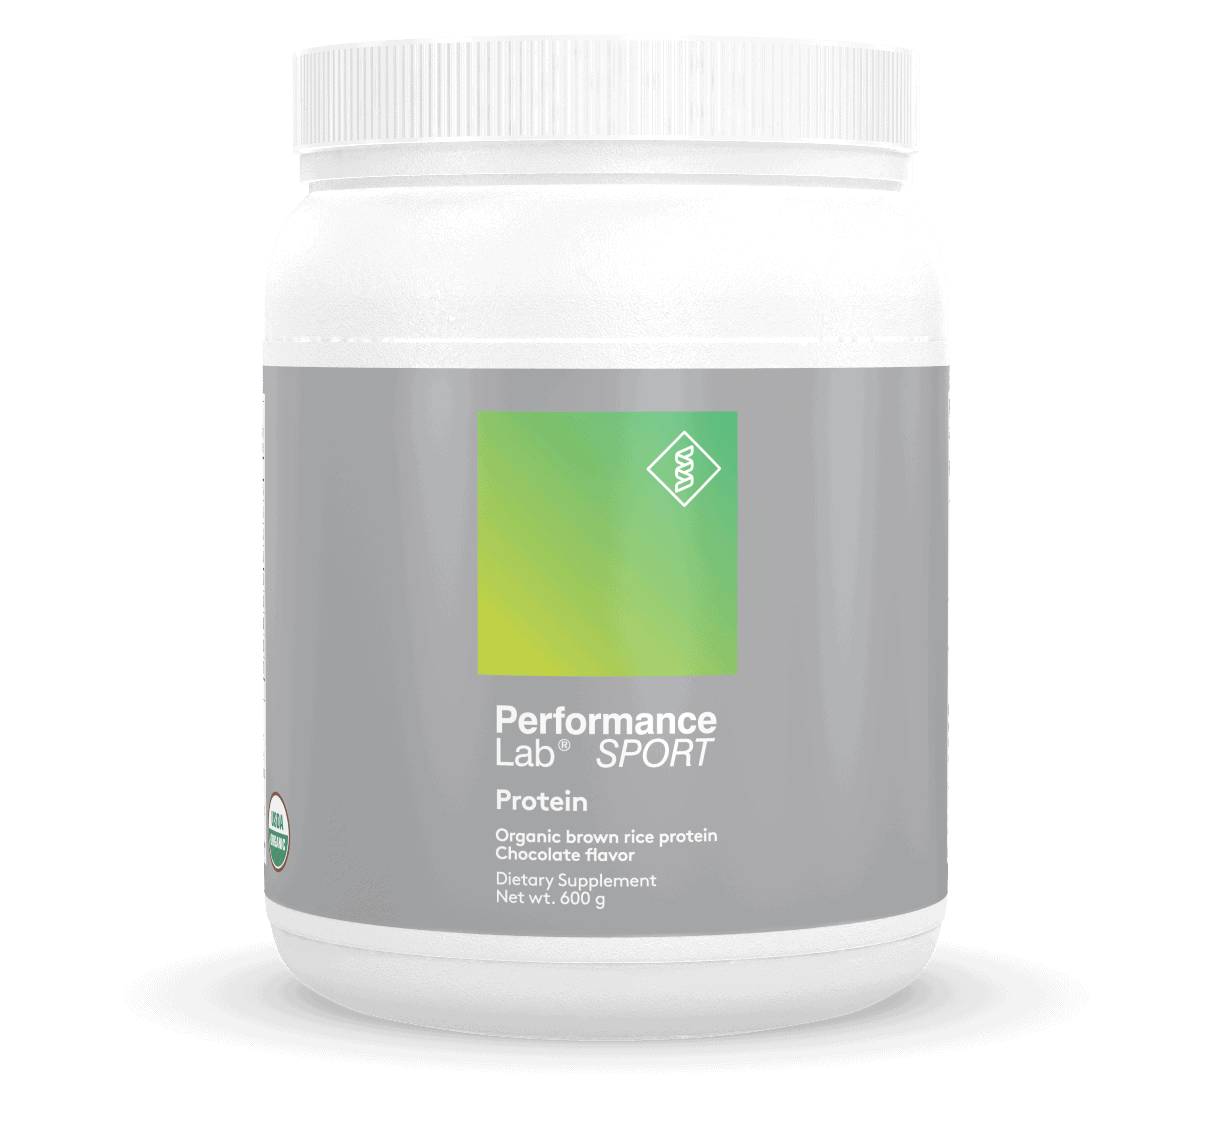 Performance Lab SPORT Protein (Brown Rice Protein)